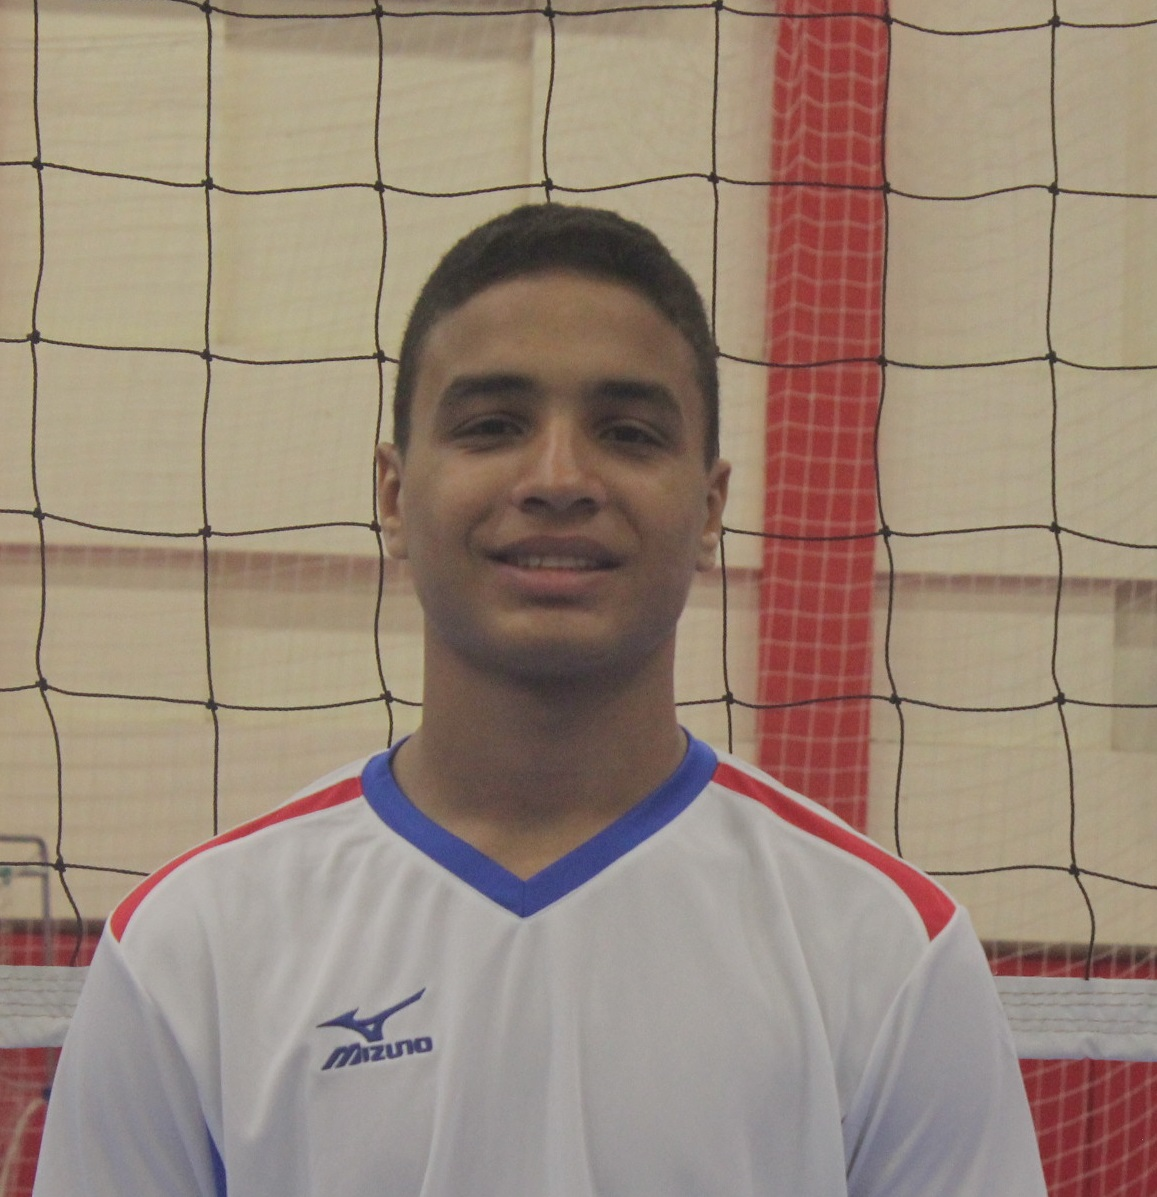 Ahmed Azab Abdelrahman